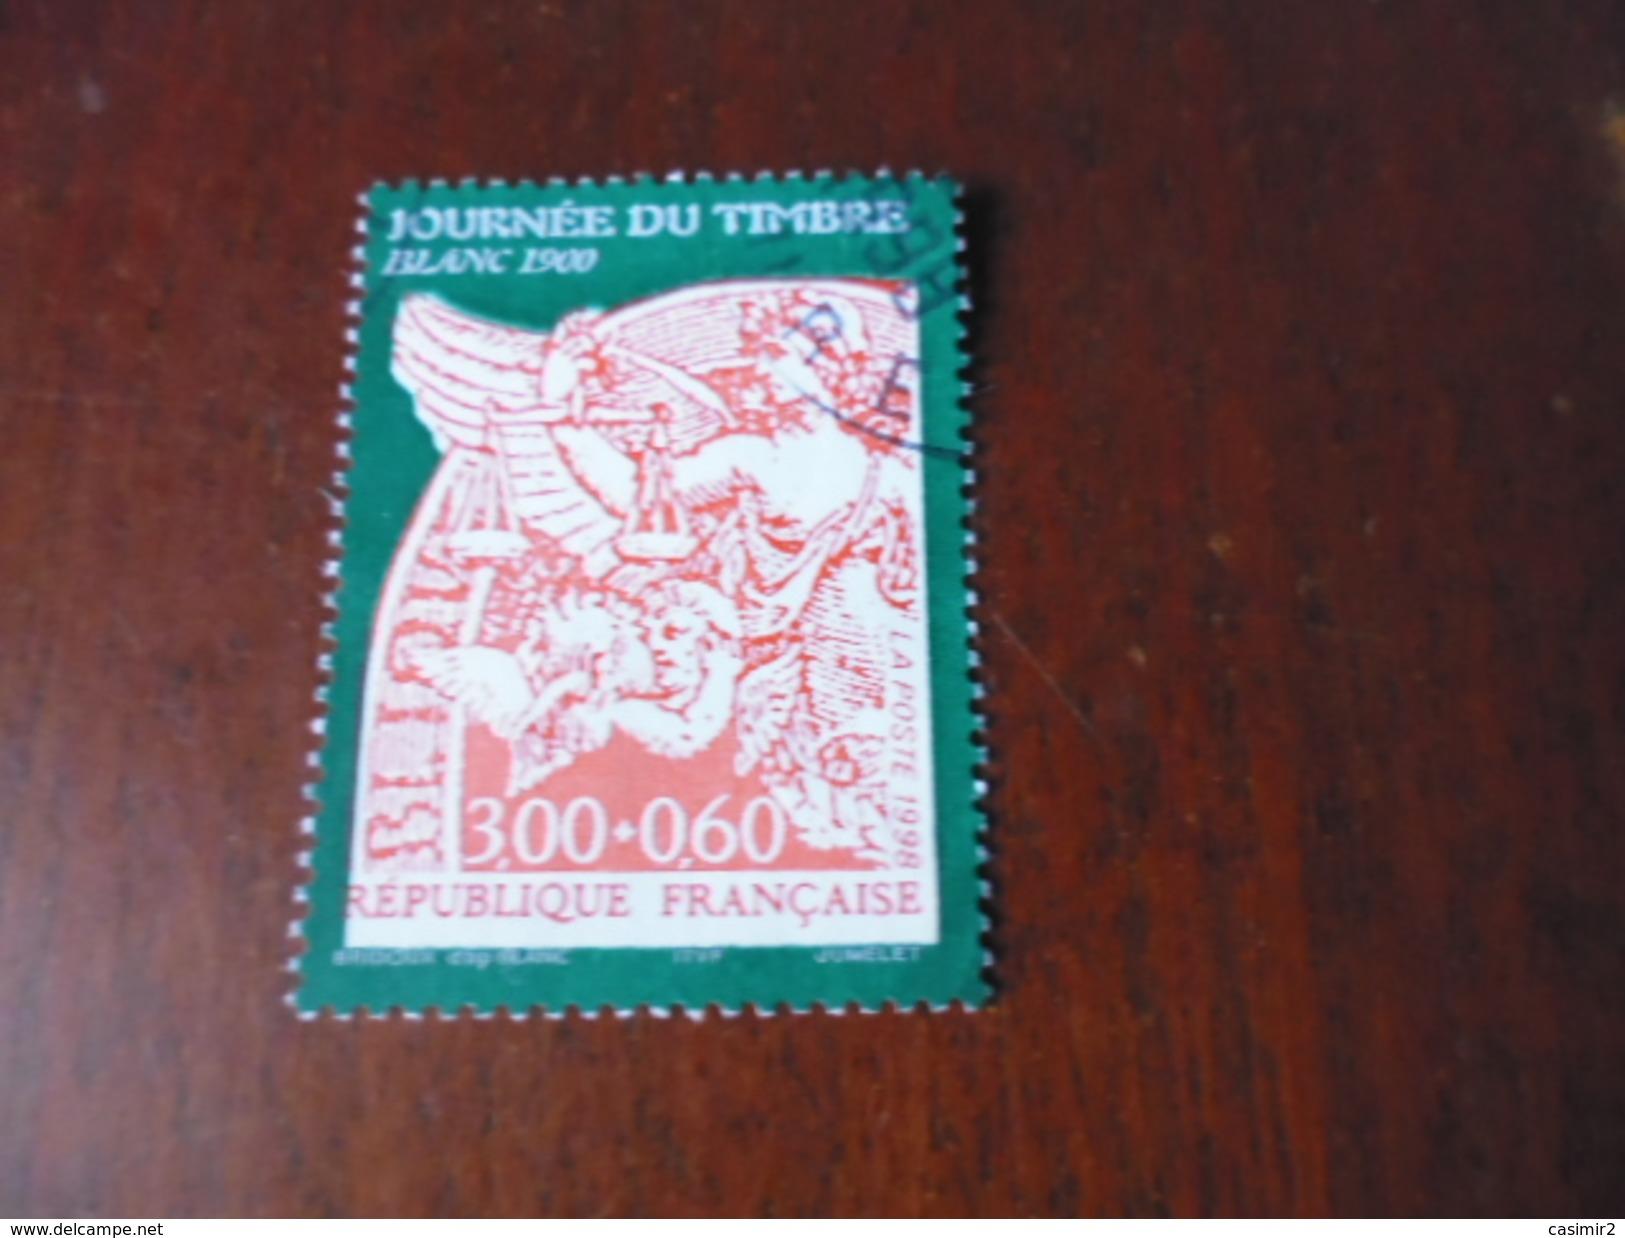 FRANCE Obliteration Choisie  YVERT N° 3135 - Frankreich